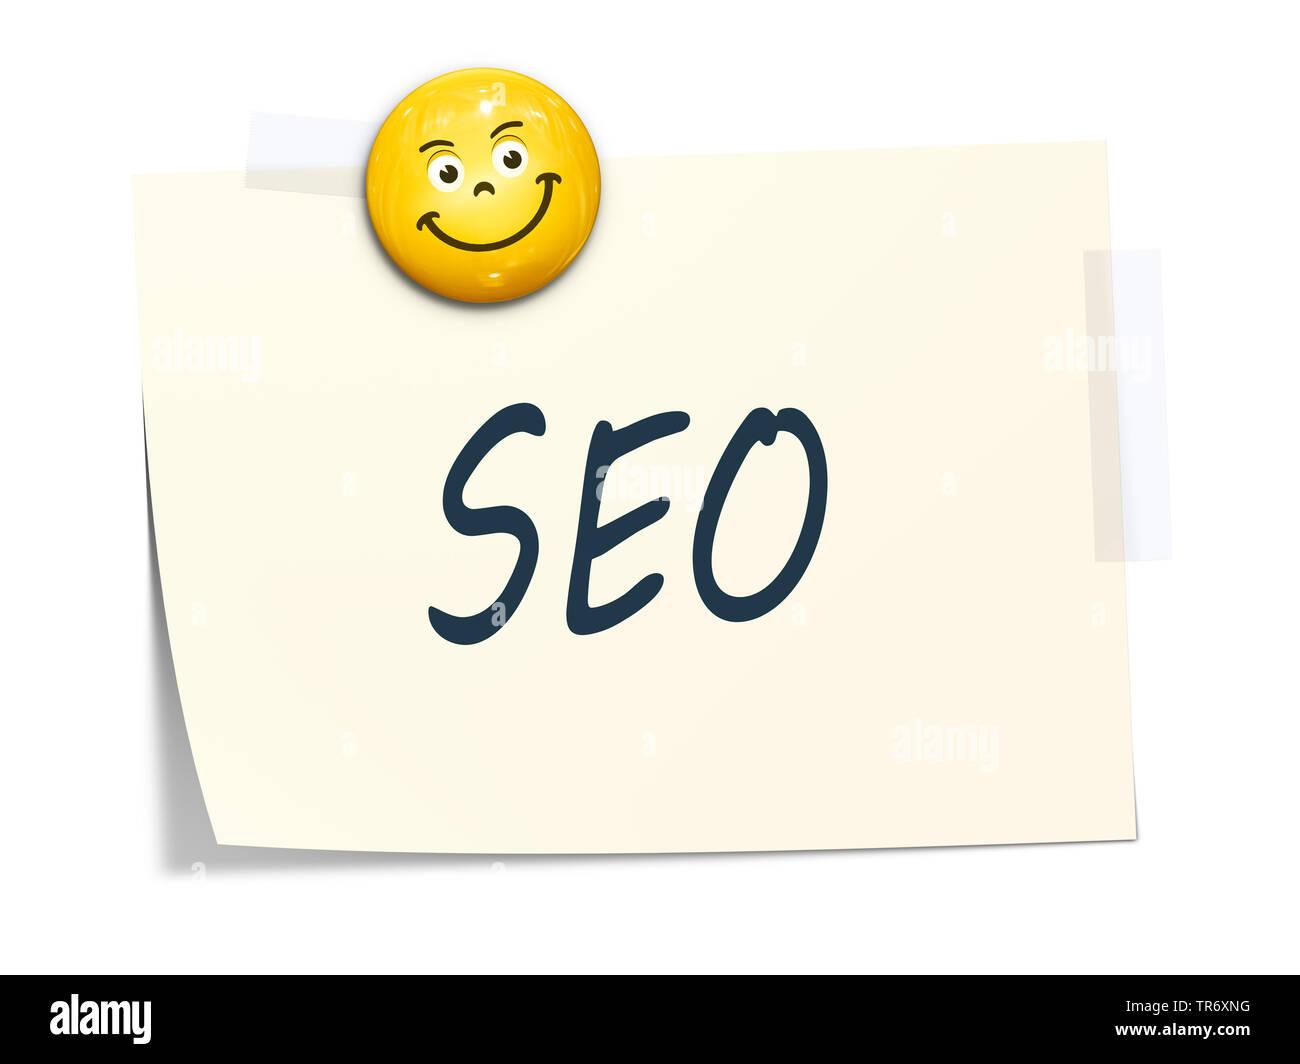 3D-Computergrafik, Notizzettel in Gelb mit Smiley mit Aufschrift SEO (search engine optimization) | 3D computer graphic, memo in yellow color with smi - Stock Image